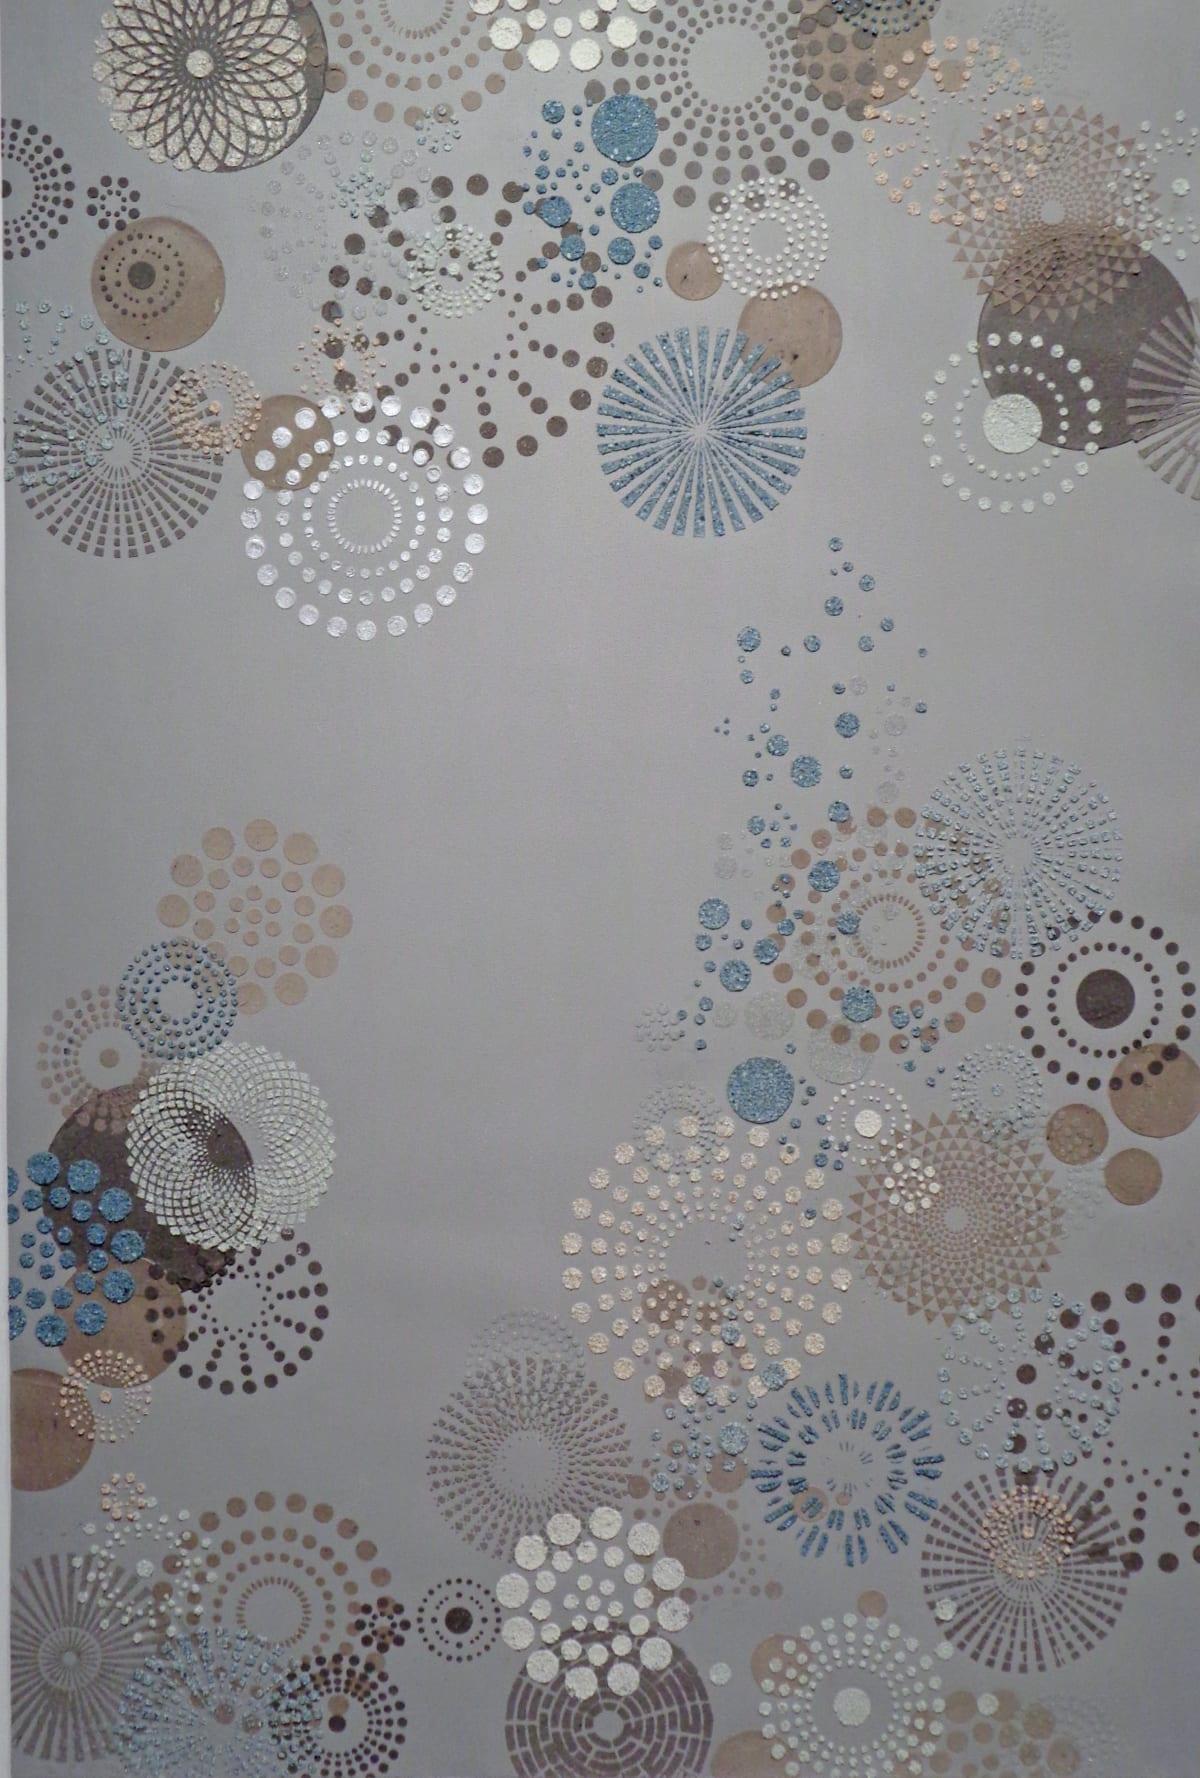 Eleanor White, Grey Multi Dot (large), 2018